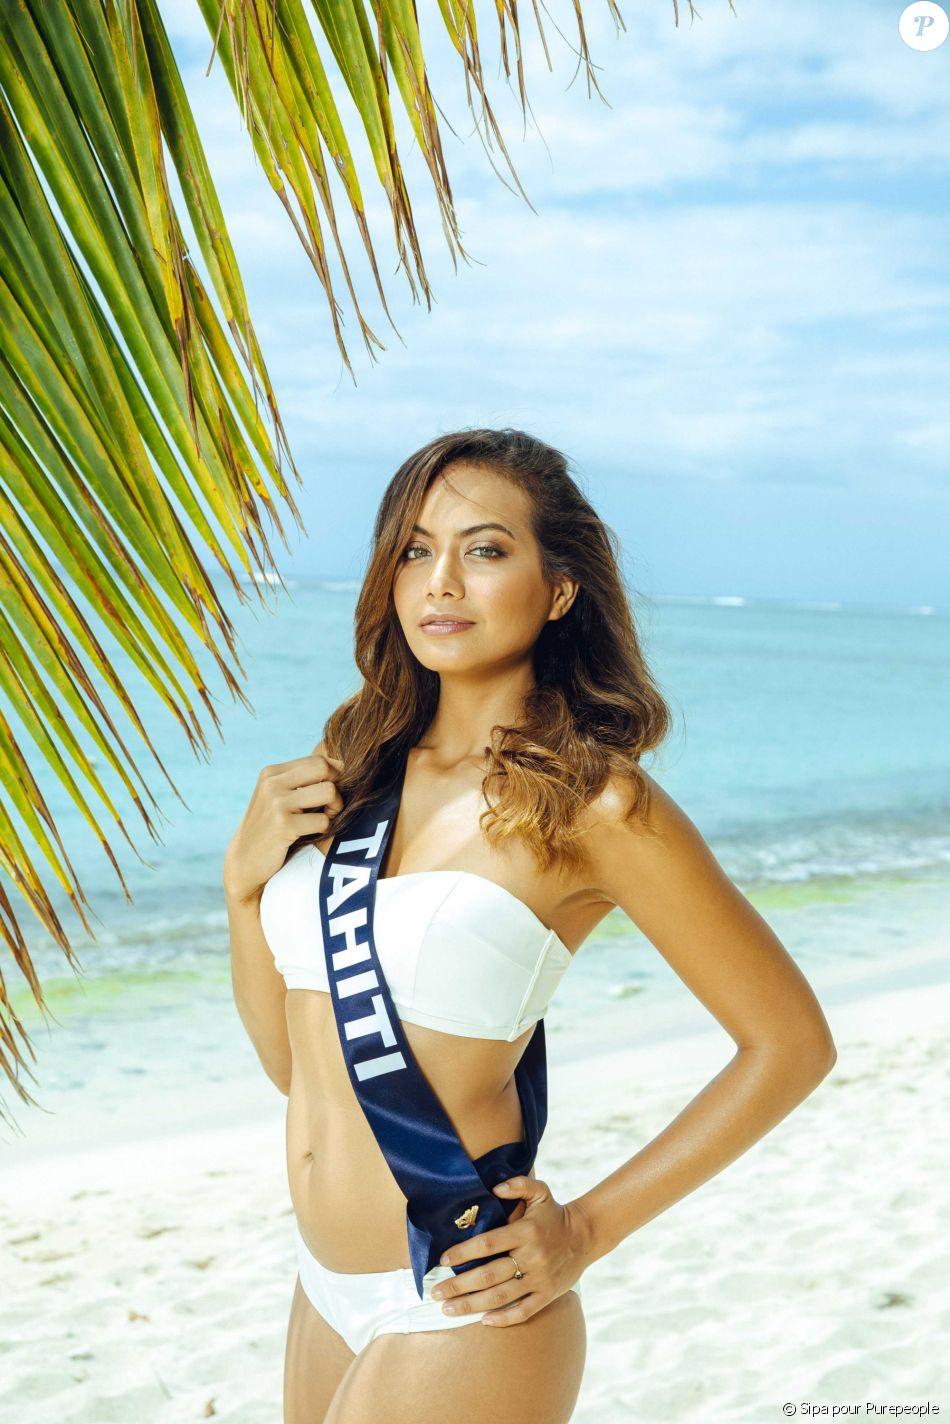 Concours Miss France : Vaimalama sublime en bikini